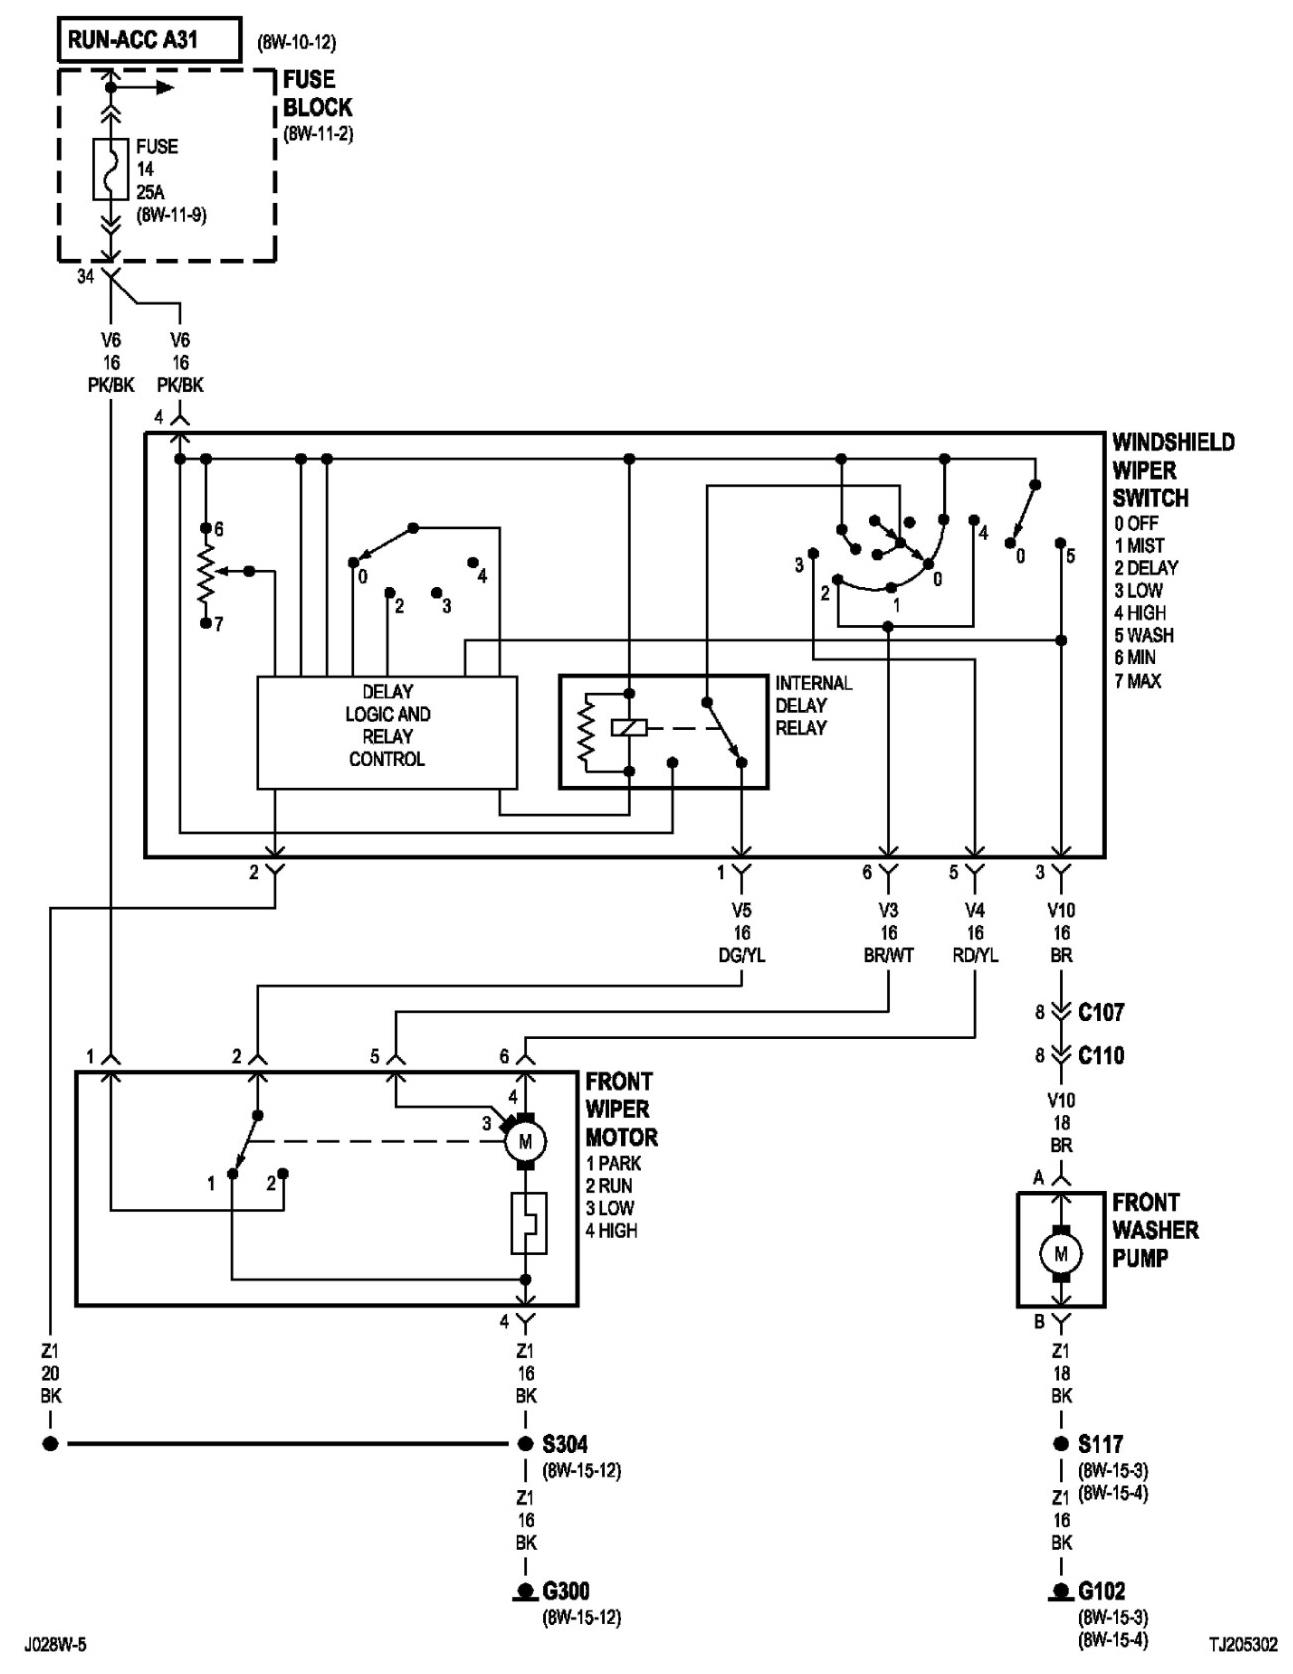 2010-11-29_192654_wiper_0000  Jeep Liberty Tail Light Wiring Diagram on